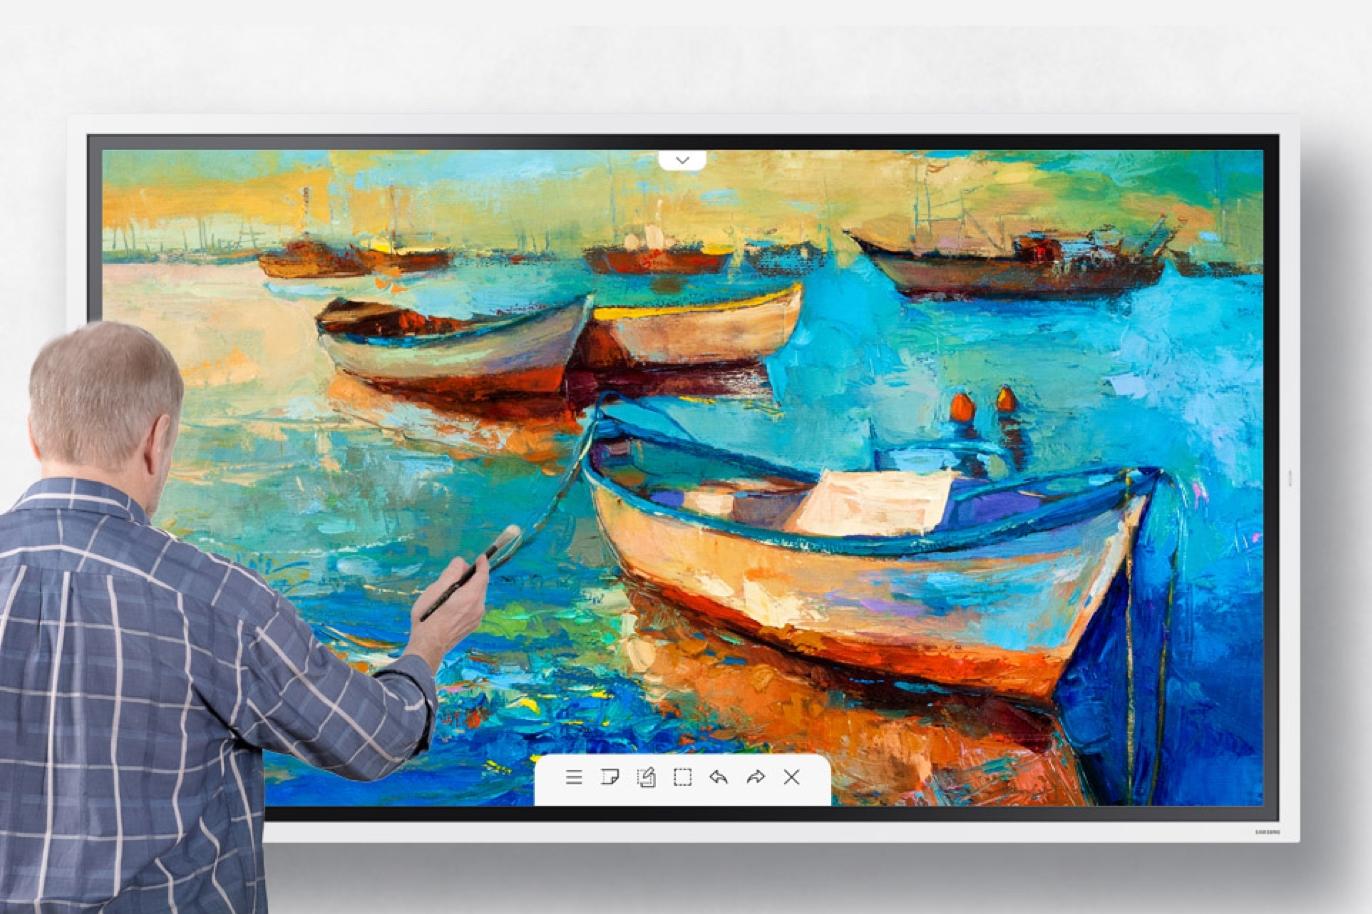 Samsung Flip 2—全新數位屏幕 - FLIP 65 Page6 Creating a masterpiece 6 1 THREE COLUMN